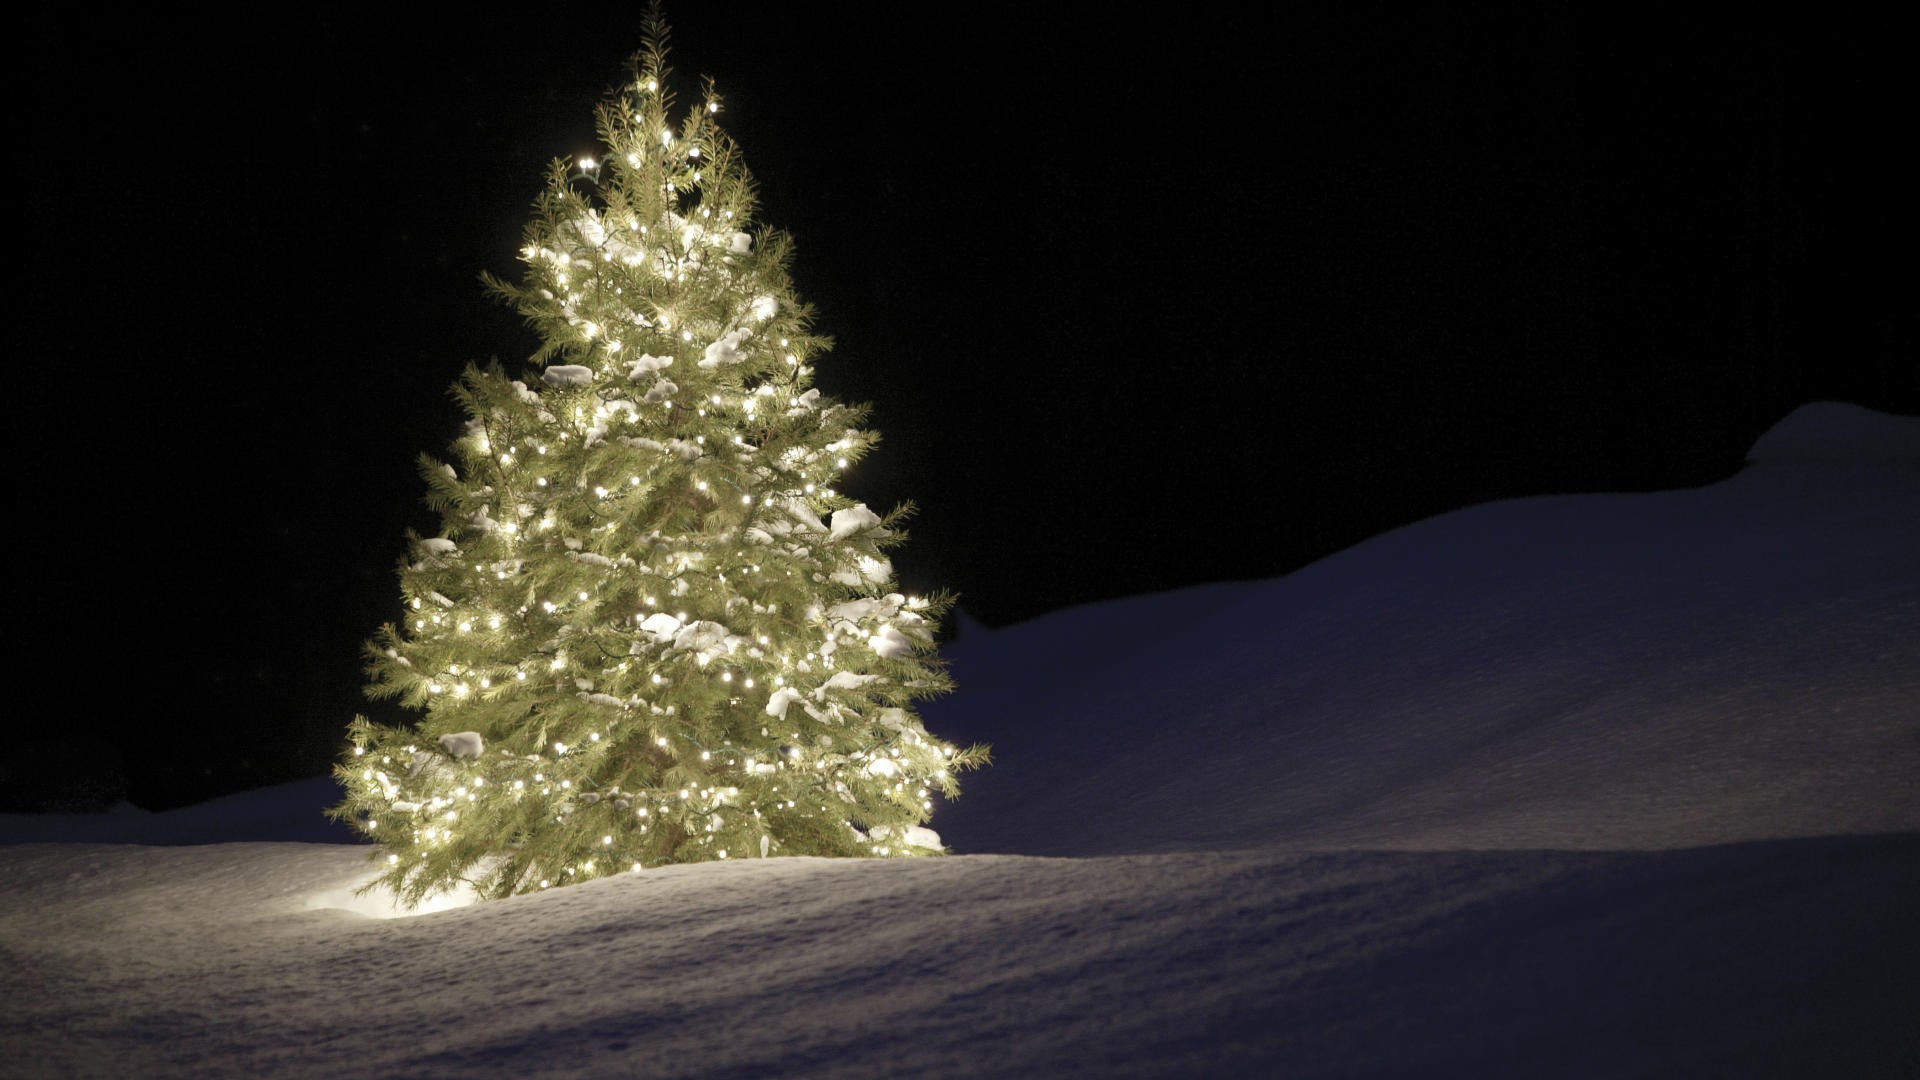 Black Christmas Tree With Lights